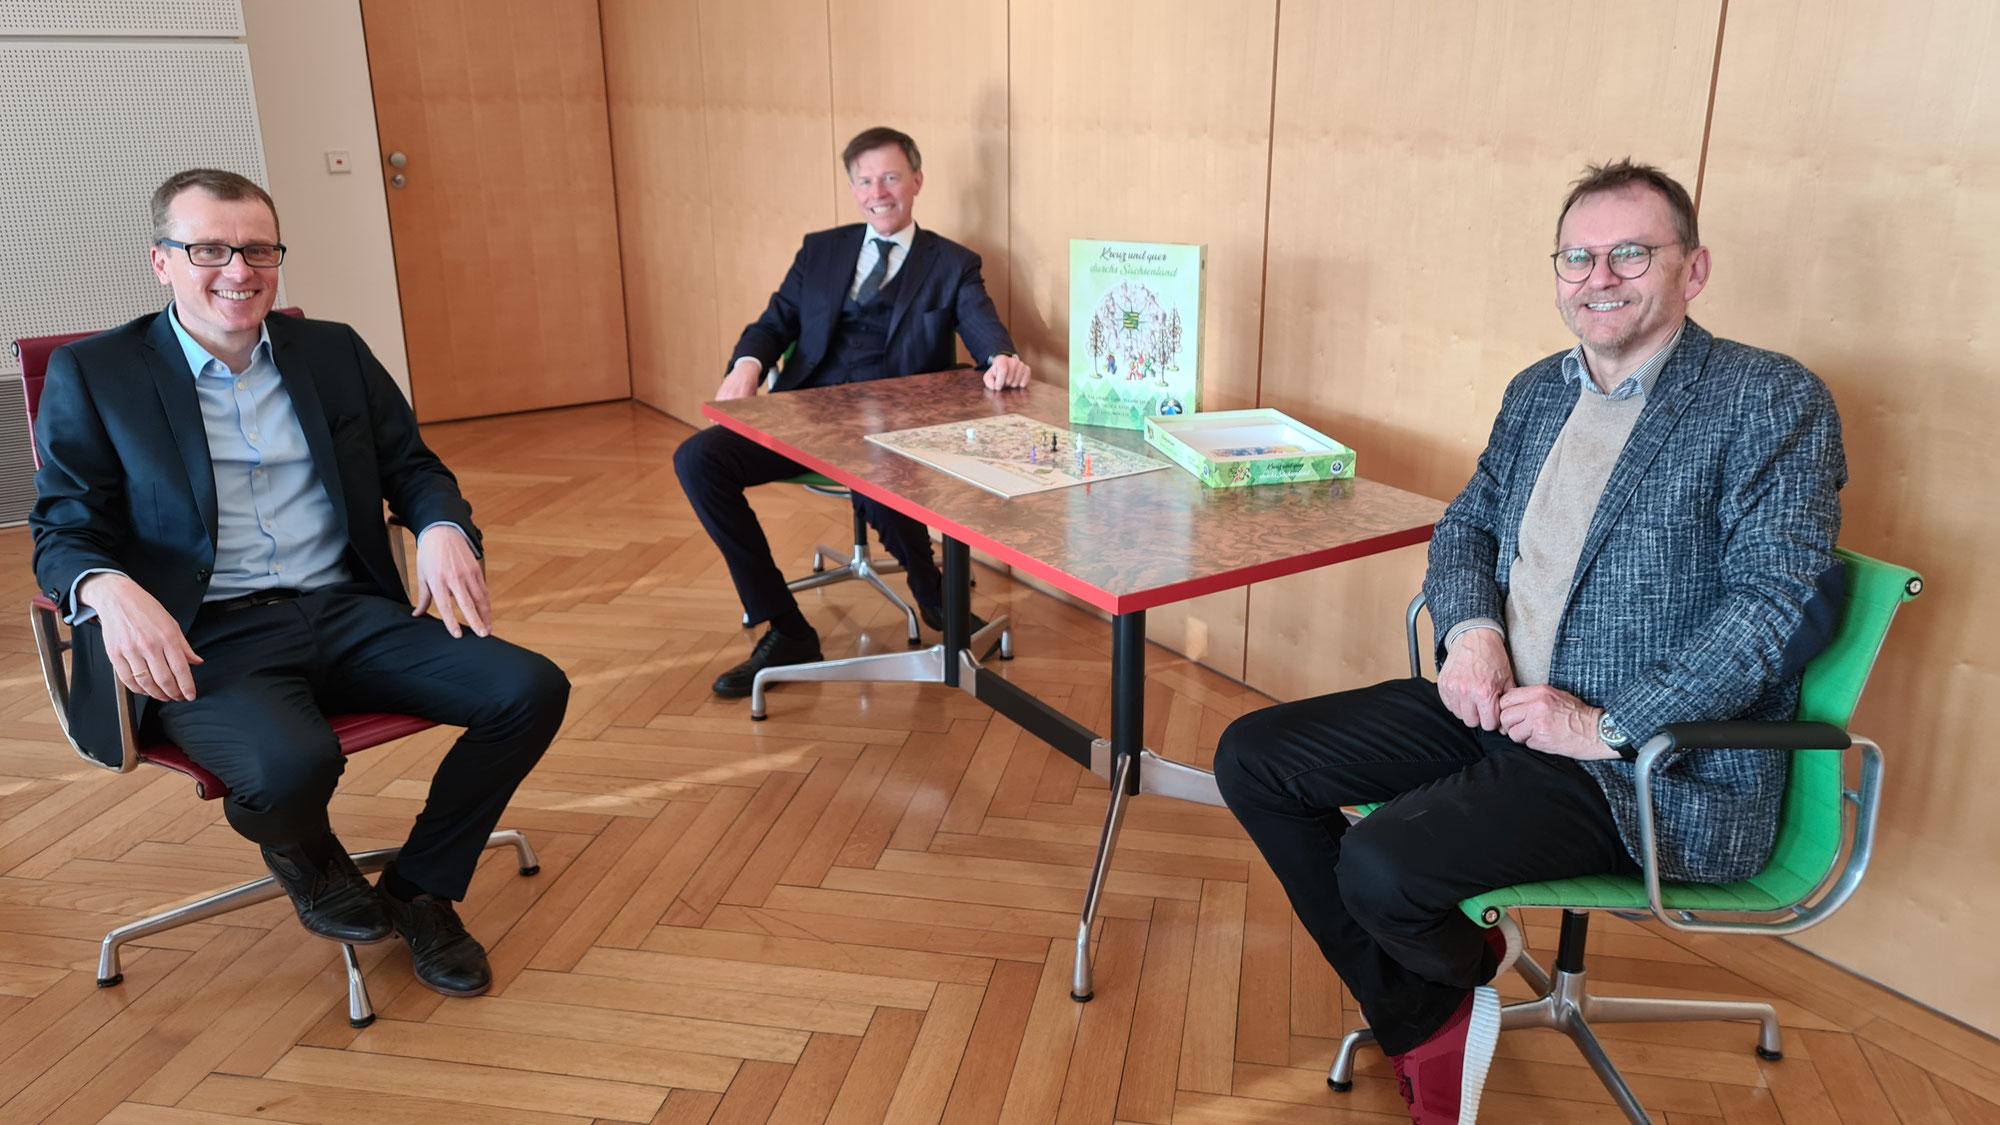 Erzgebirger präsentiert Sachsenspiel